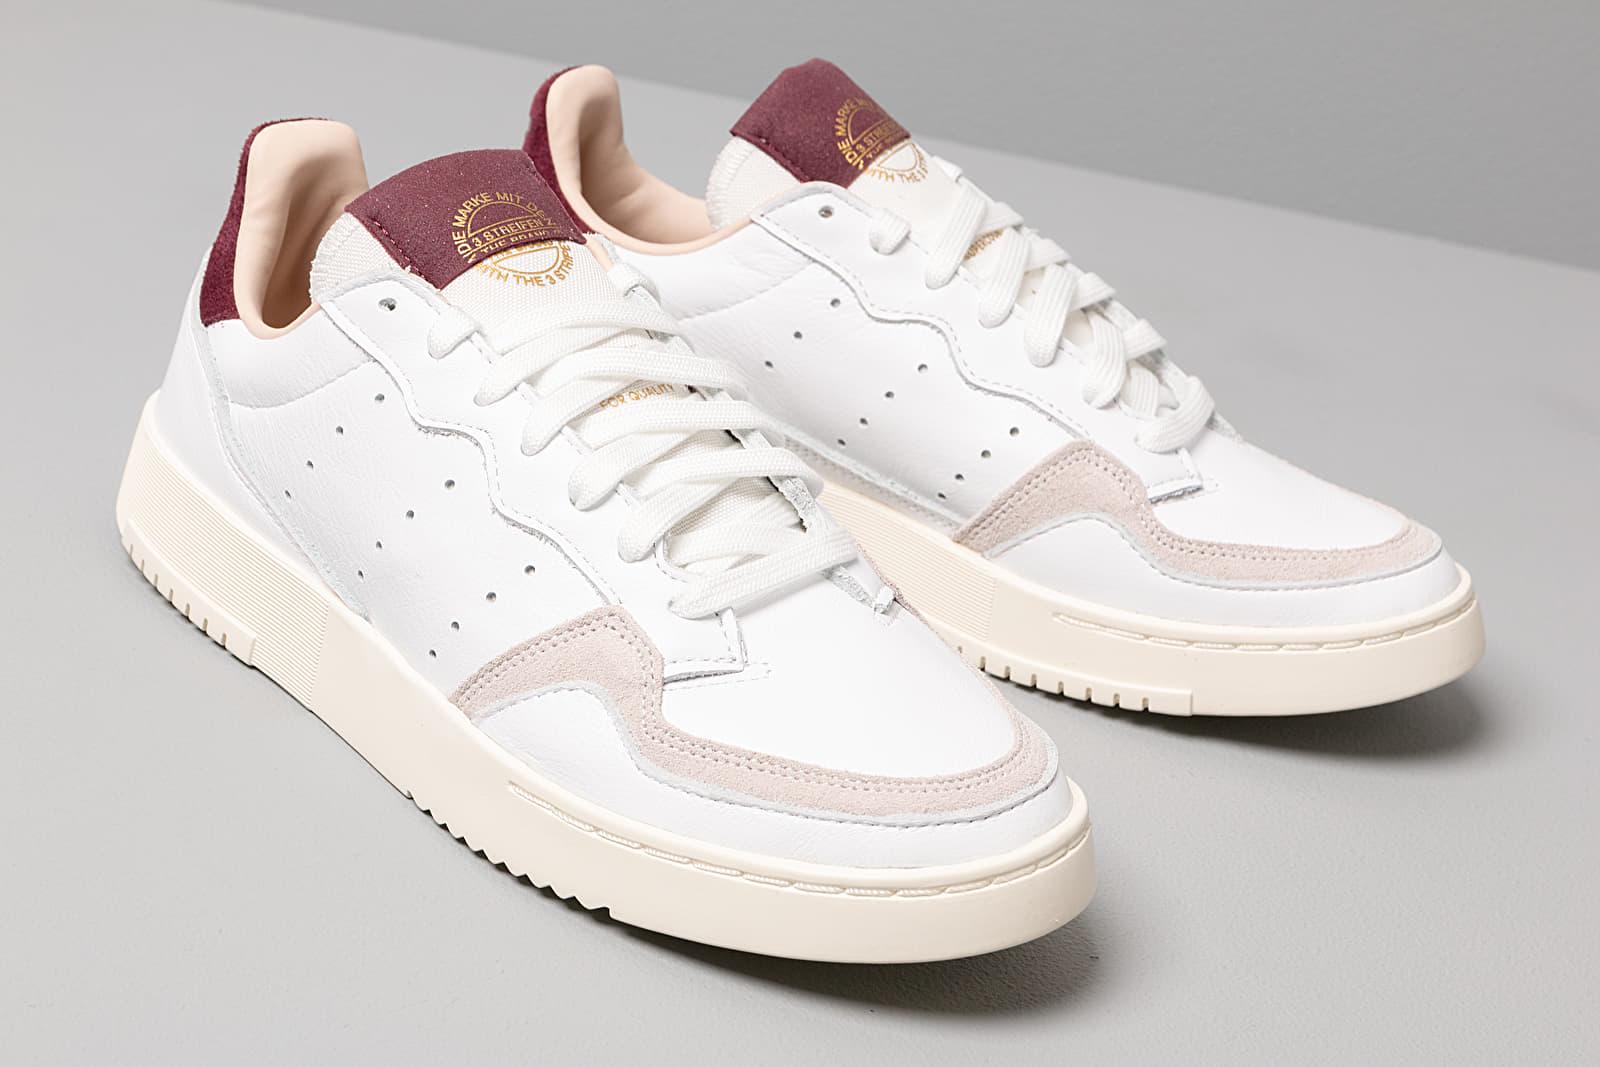 adidas Supercourt WFtw White Ftw White Maroon